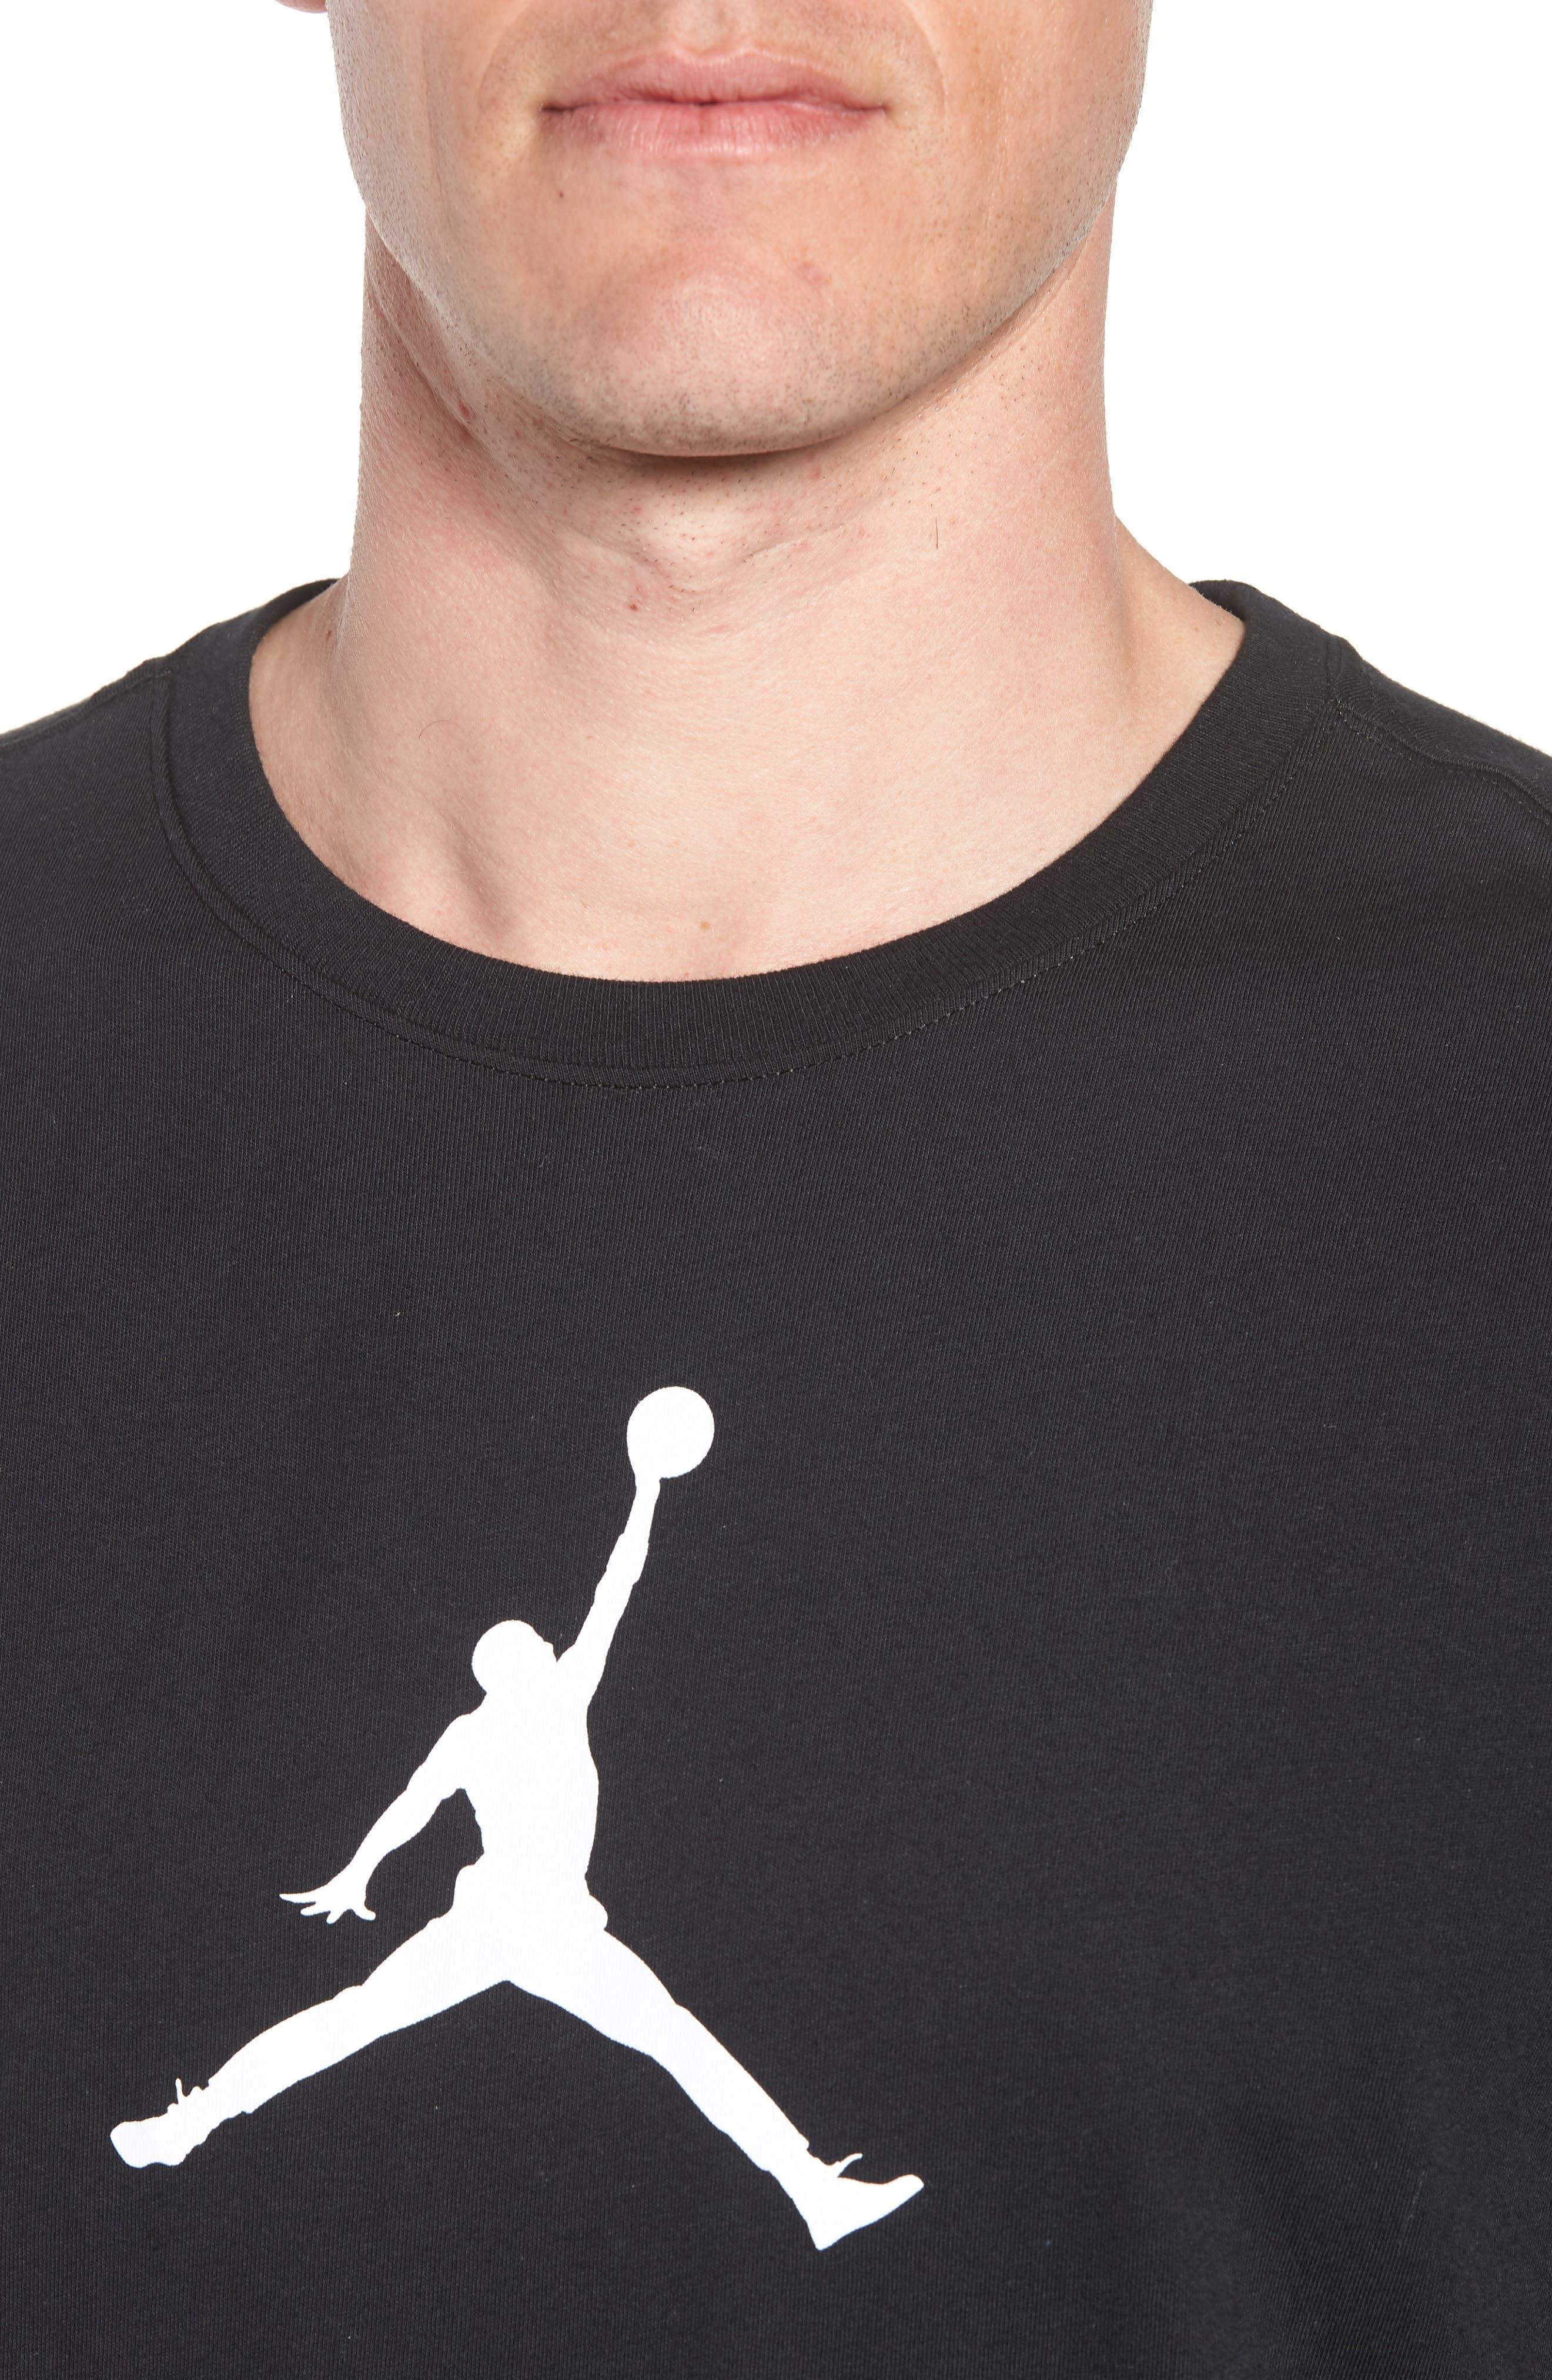 Iconic Jumpman Graphic T-Shirt,                             Alternate thumbnail 4, color,                             Black/ White